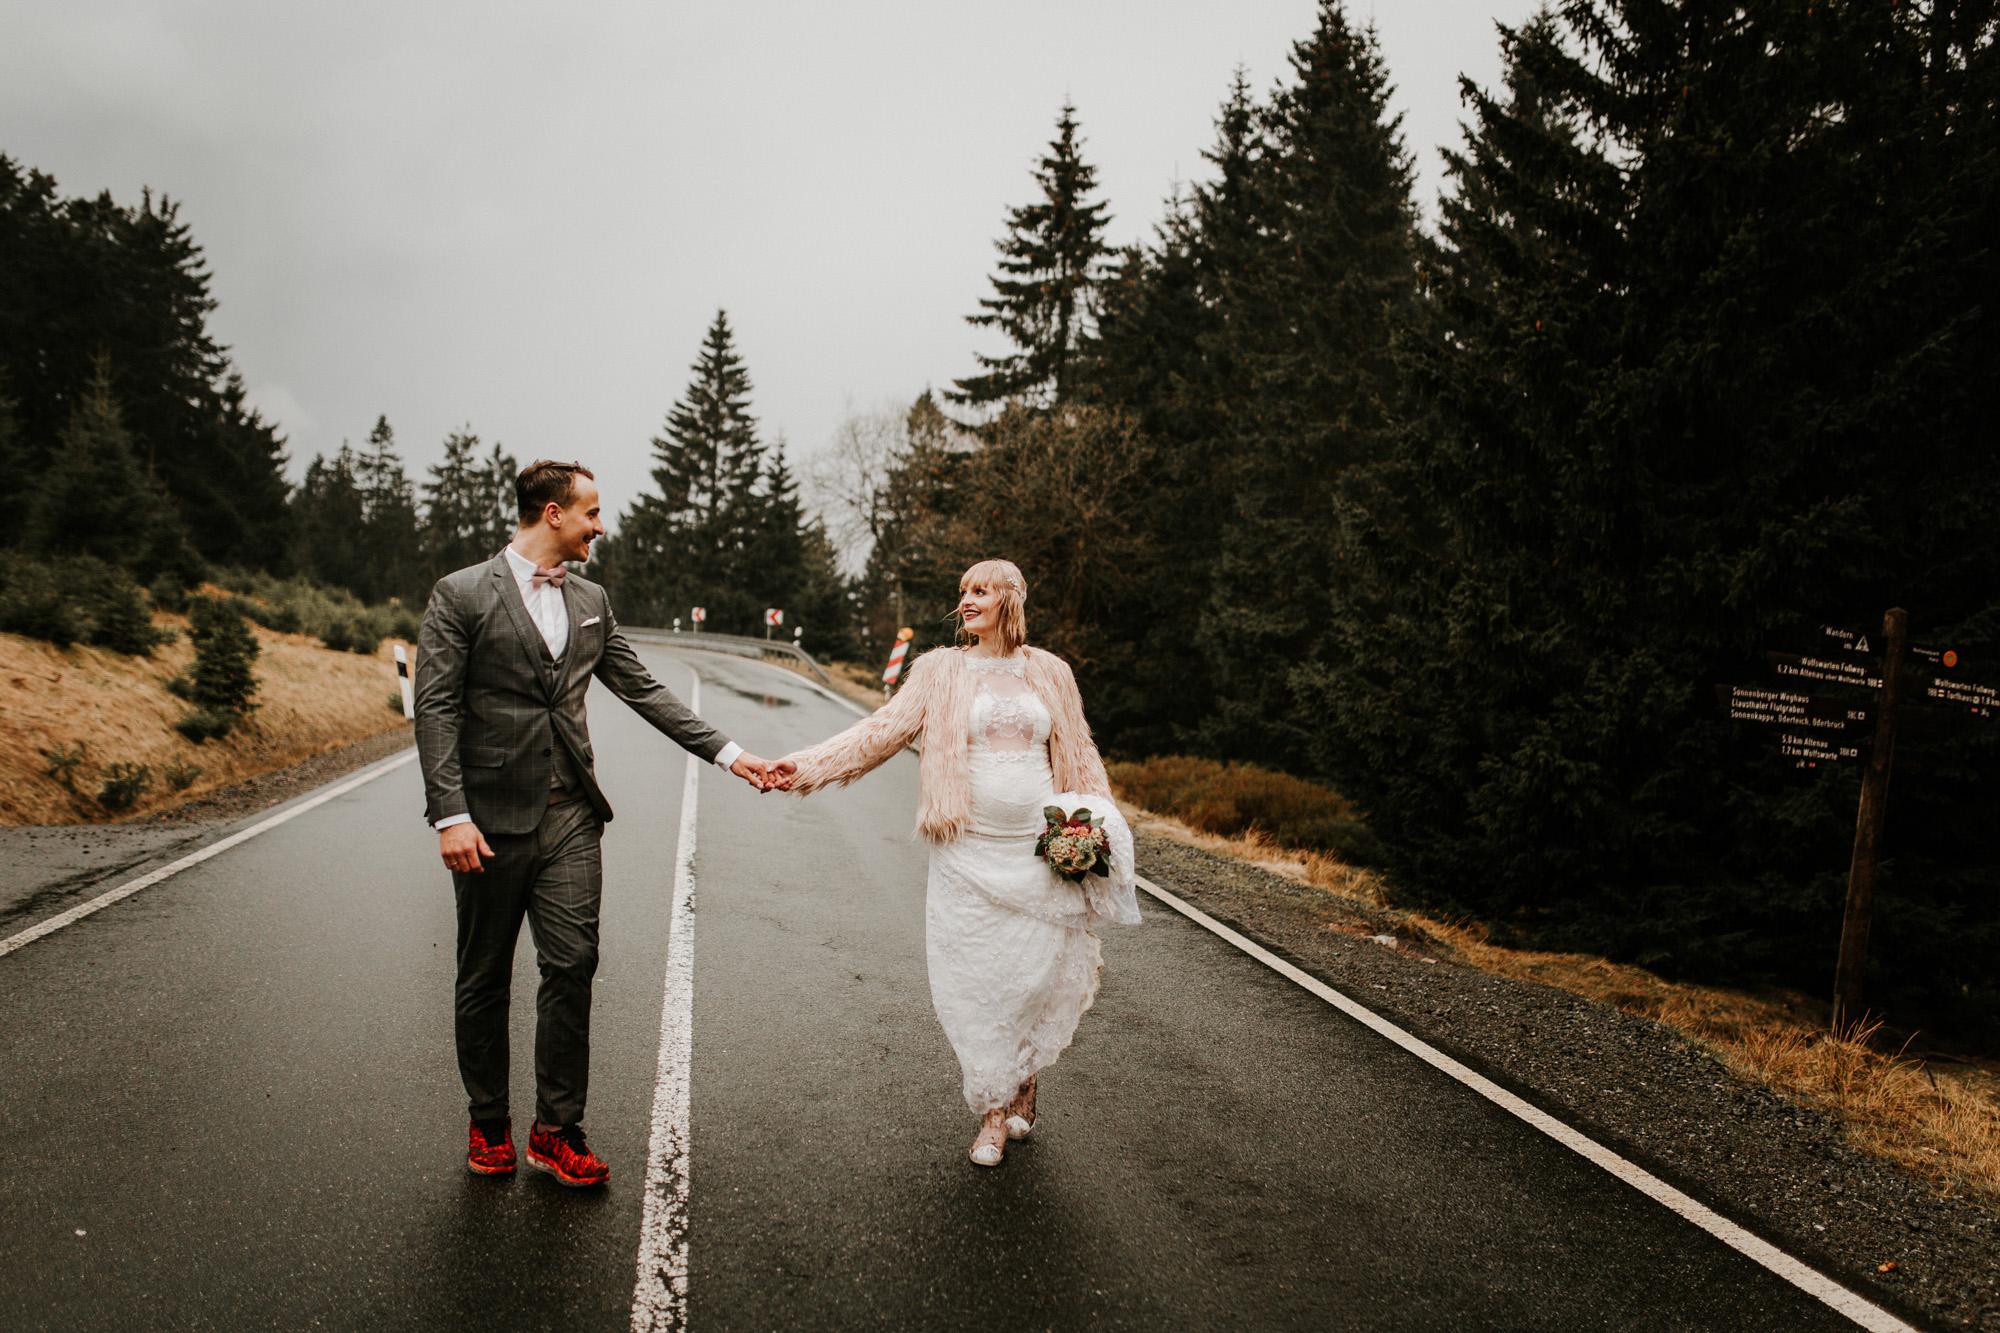 DanielaMarquardtPhotography_Hochzeitsfotograf_Düsseldorf_Köln_Mallorca_Bayern_Austria_Harz_LinaundMaik_Afterwedding-Shooting_Weddingphotographer_Ibiza_Tuskany_Italien_Toskana116